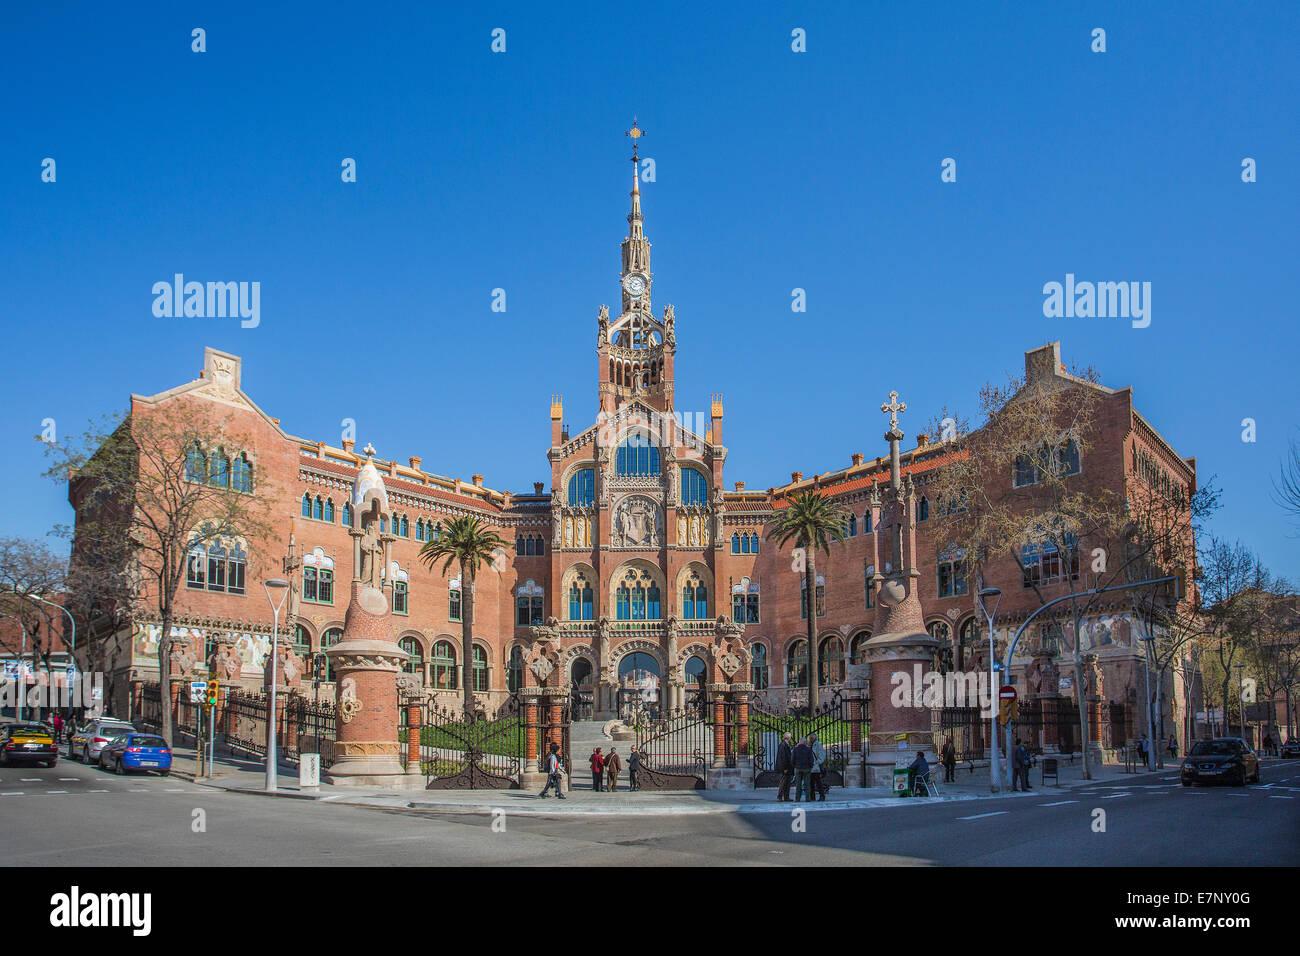 Barcelona, Catalonia, City, Domenech i Montaner, Montaner, Entrance, Hospital, Spain, Europe, St. Pau, St. Paul, - Stock Image